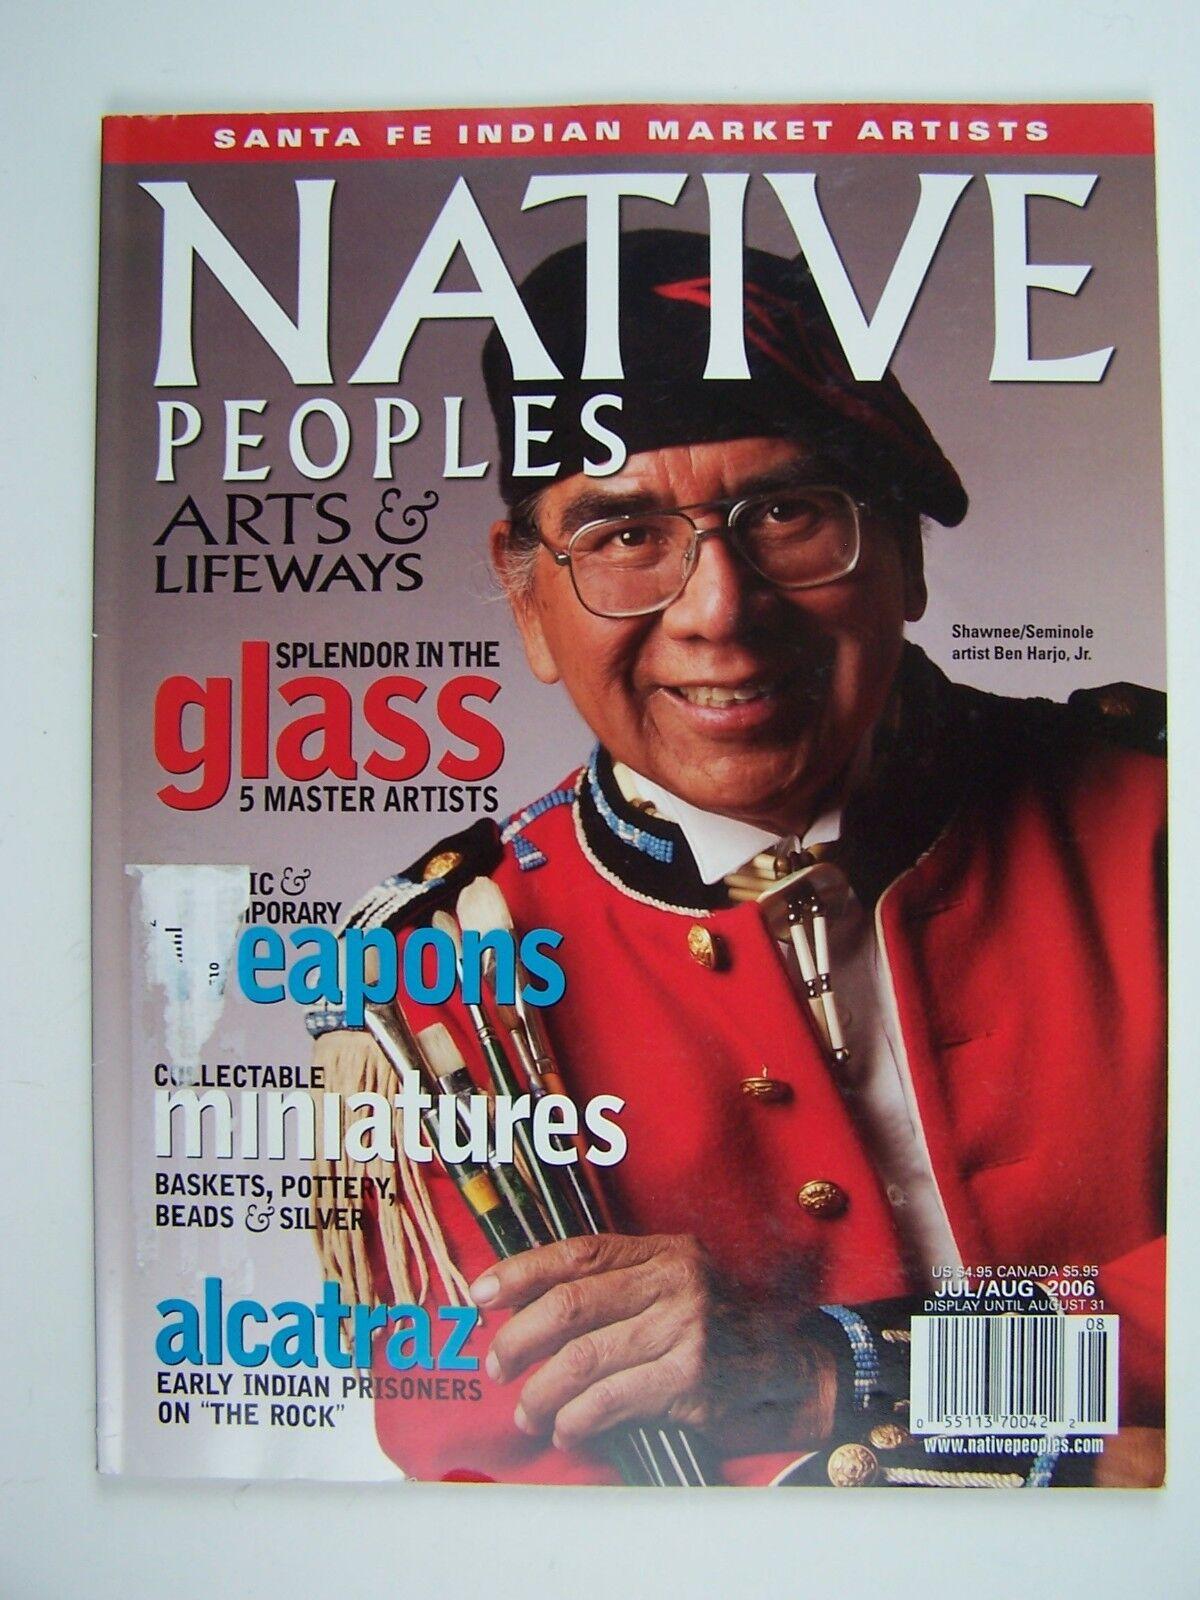 Native Peoples Arts & Lifeways Magazine Vol XIX Number